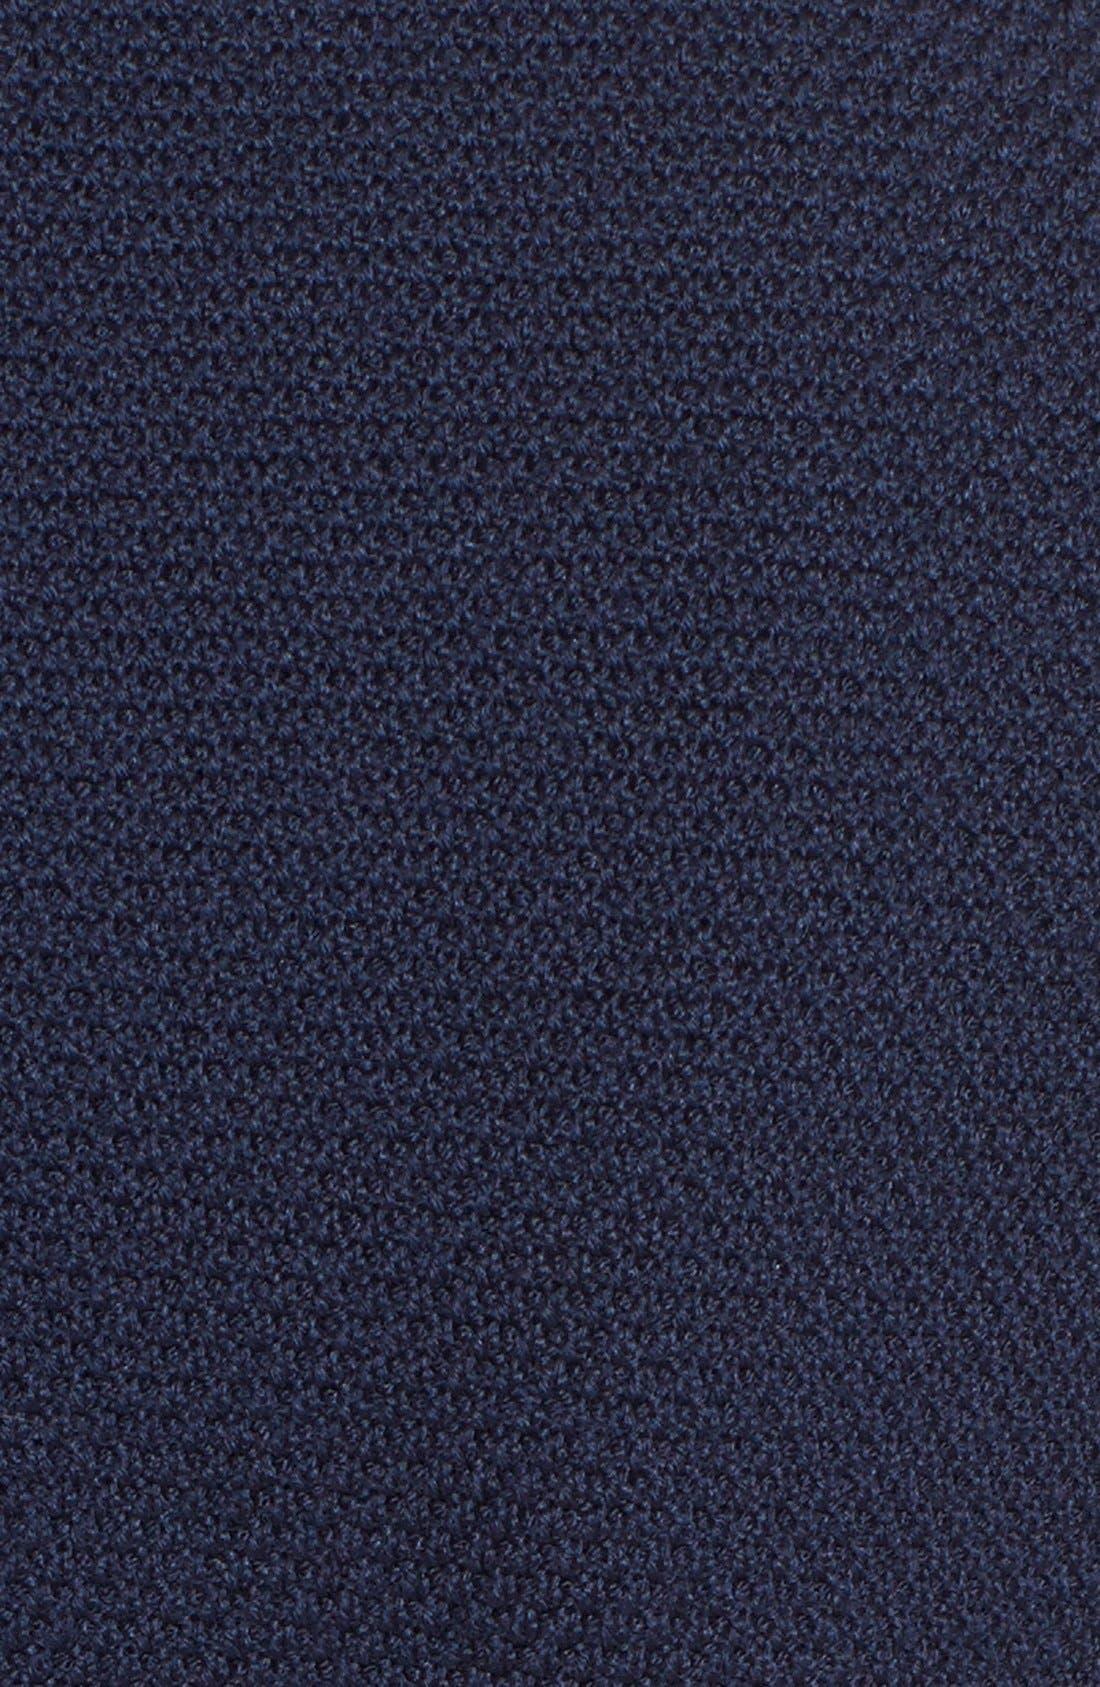 Micro Bouclé Sheath Dress,                             Alternate thumbnail 3, color,                             Navy